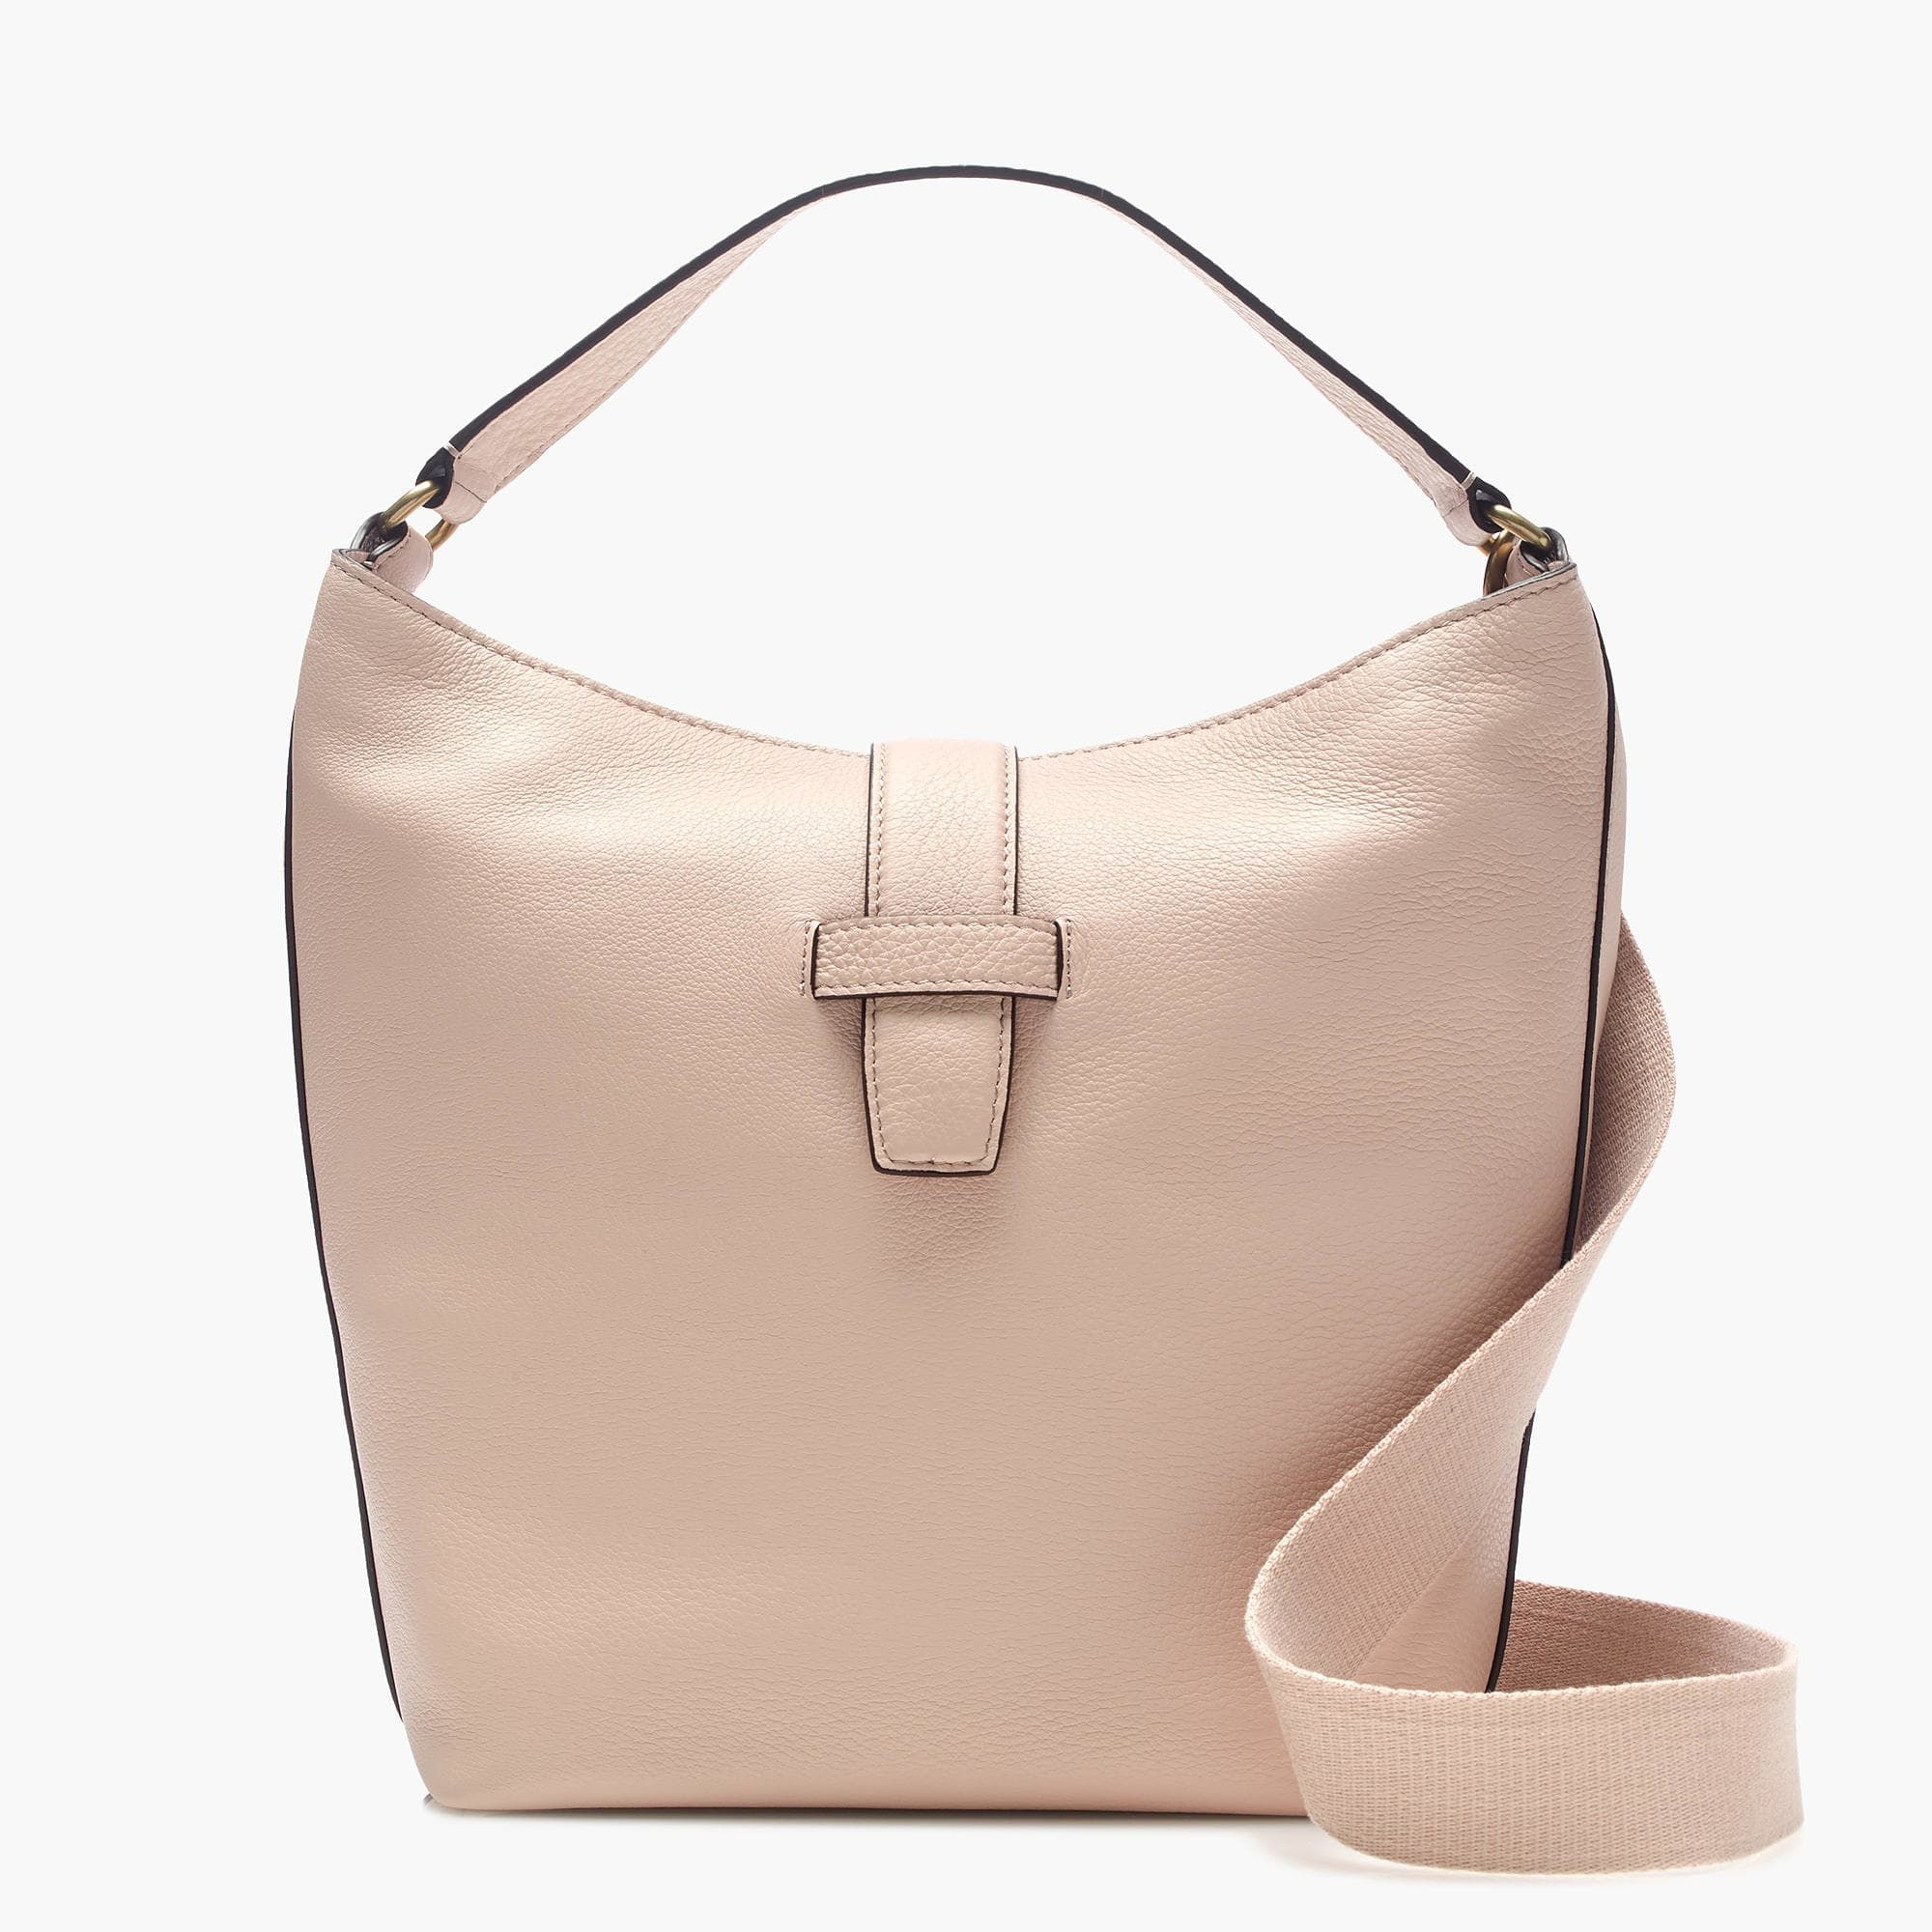 c75195571d Signet hobo bag in Italian leather   Women bags